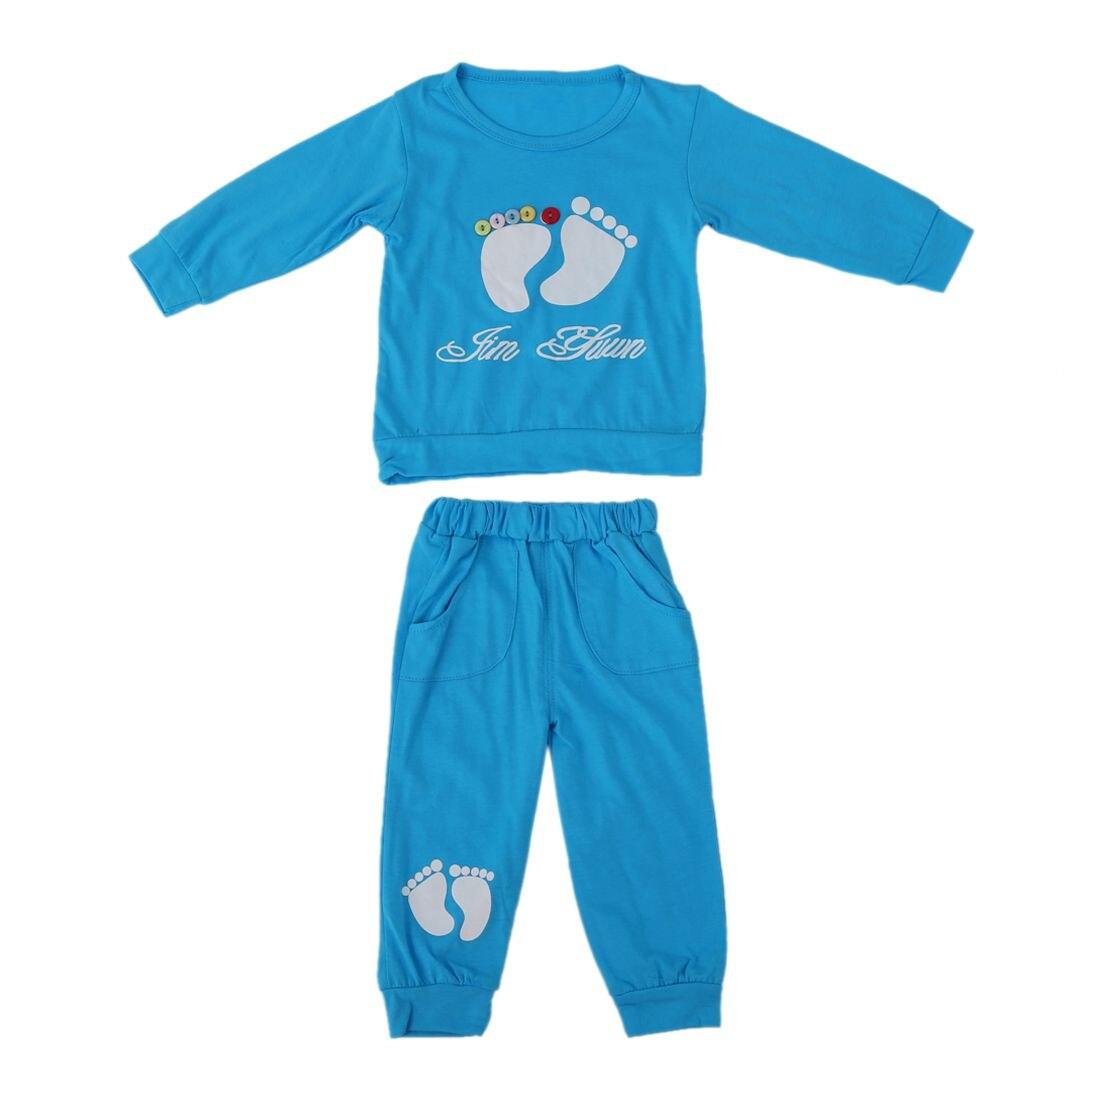 FEDI Best Sale High Quality 100% Cotton baby clothing set,Toddlers children set,baby boys girls 2 pcs Footprints ,Hot sale-Blu